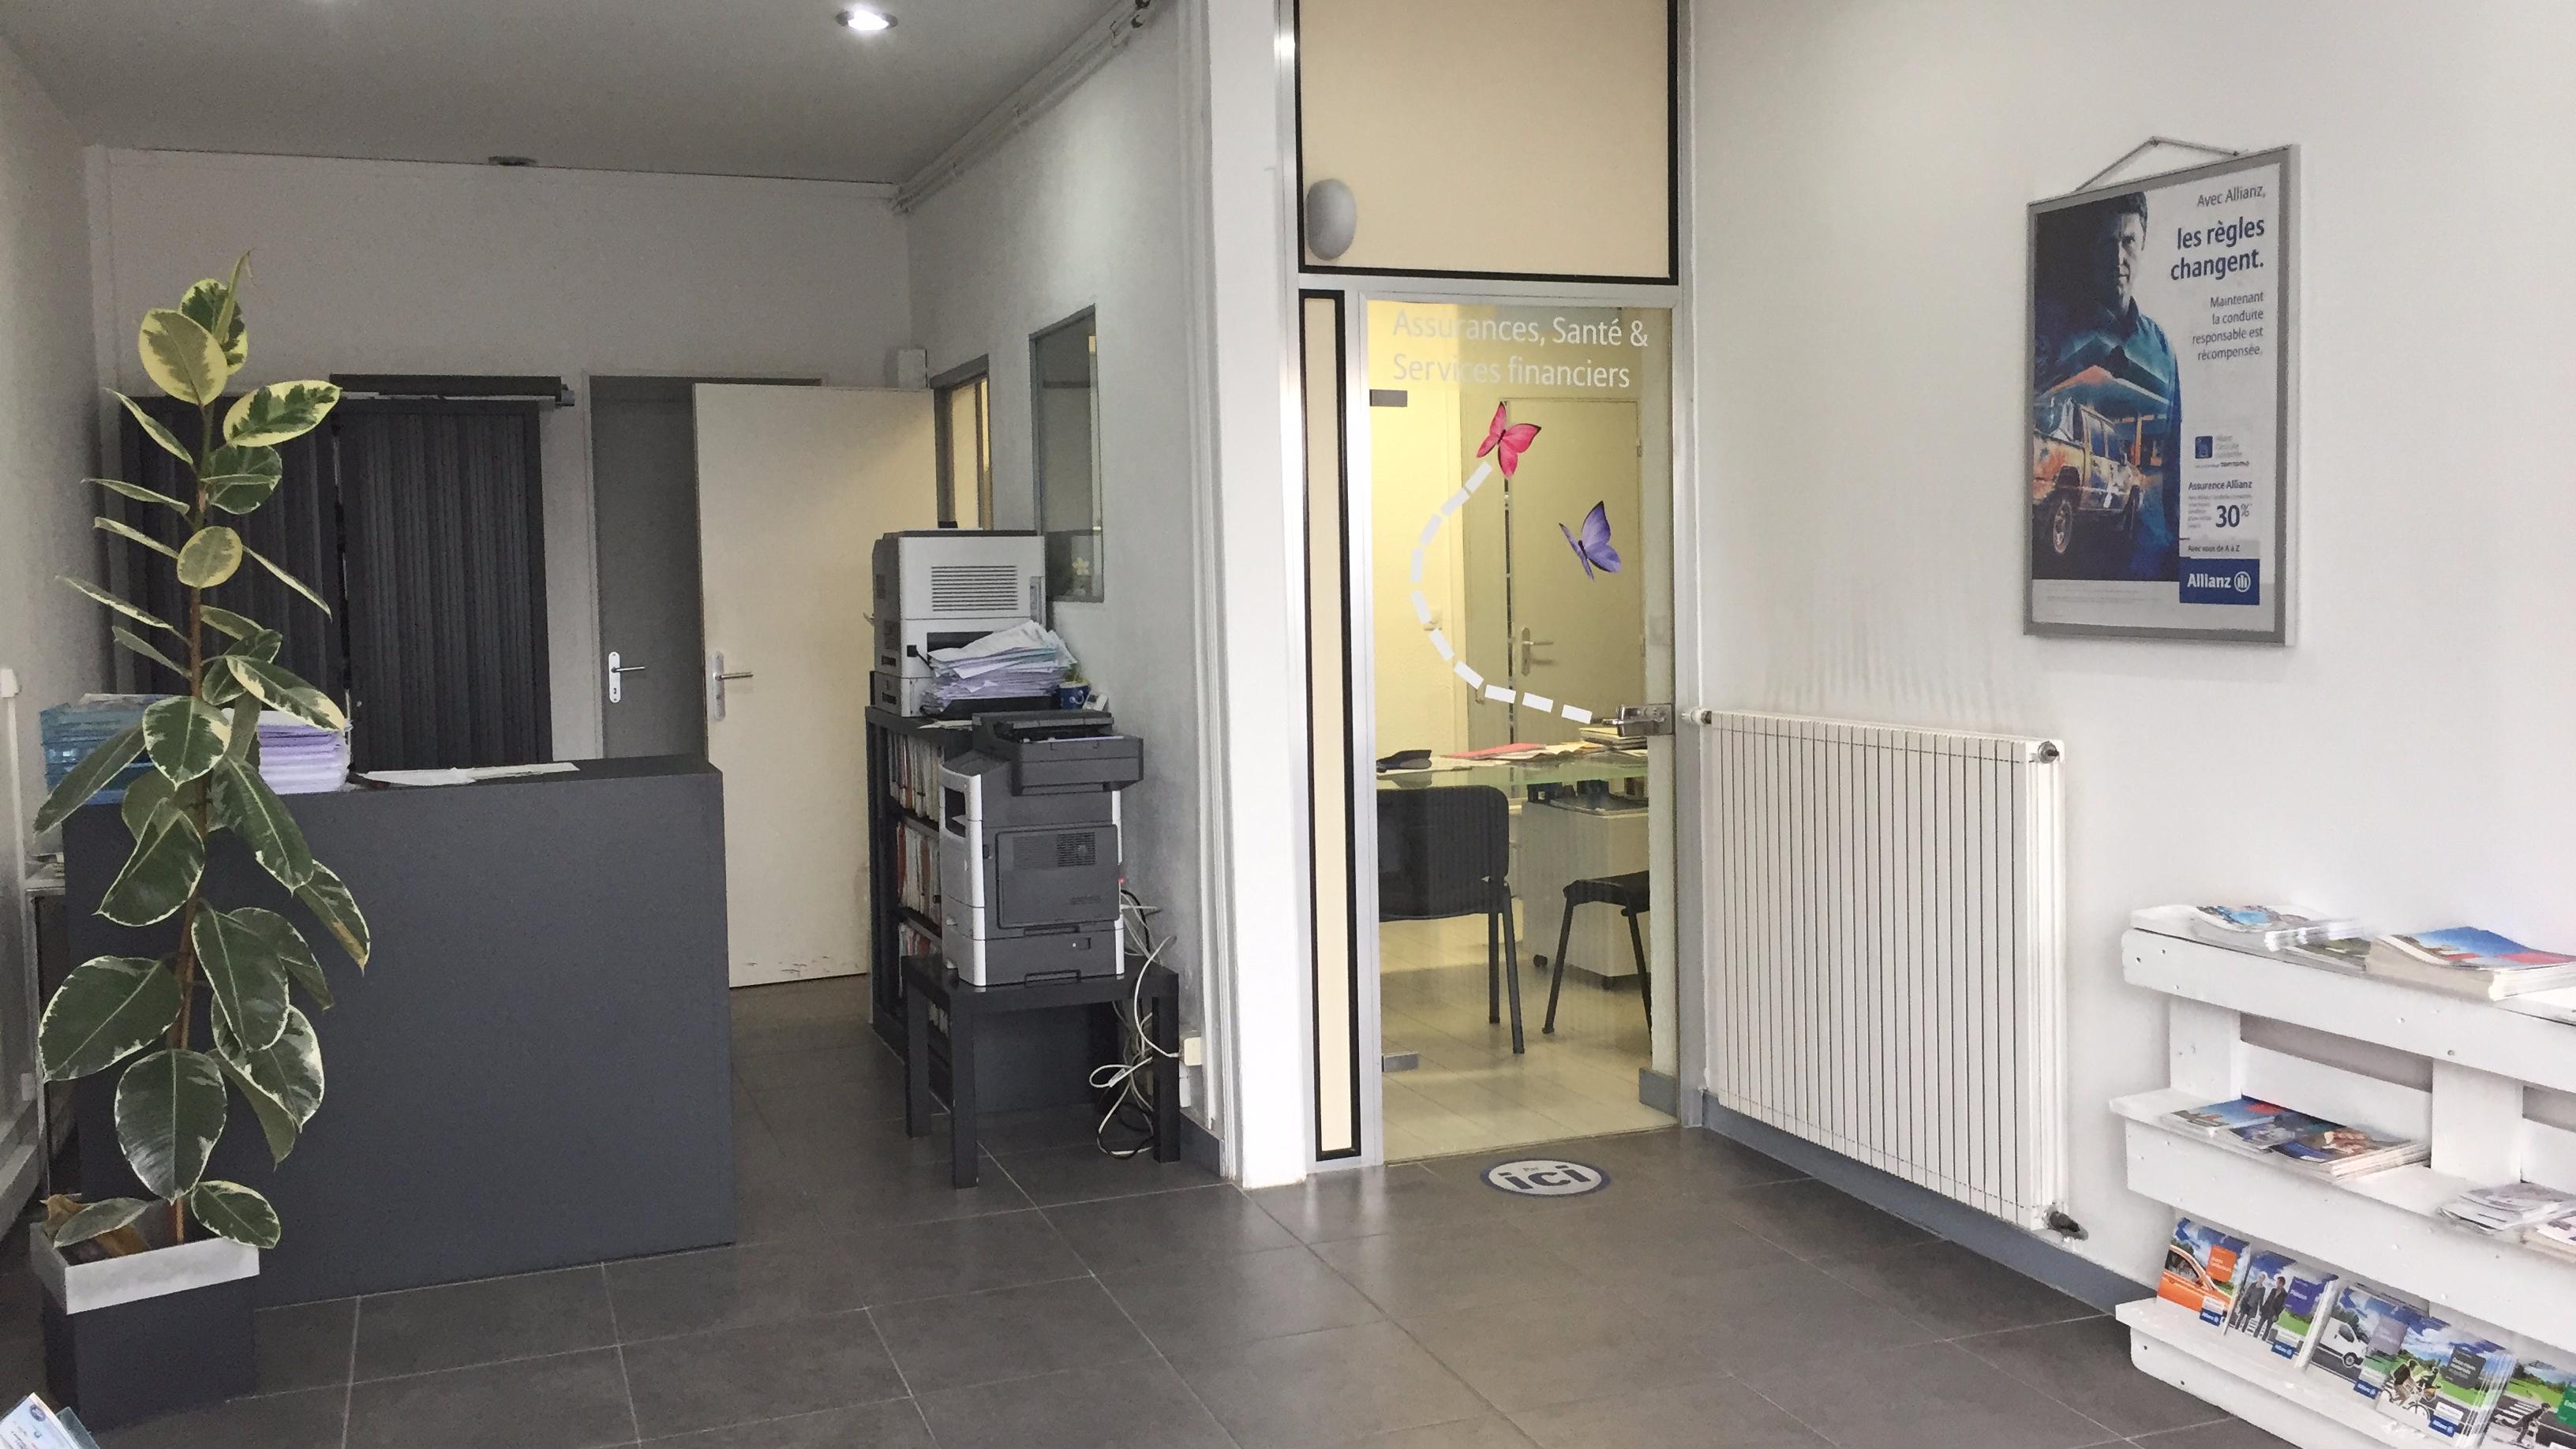 Cabinet radiologie amiens - Cabinet echographie nantes ...